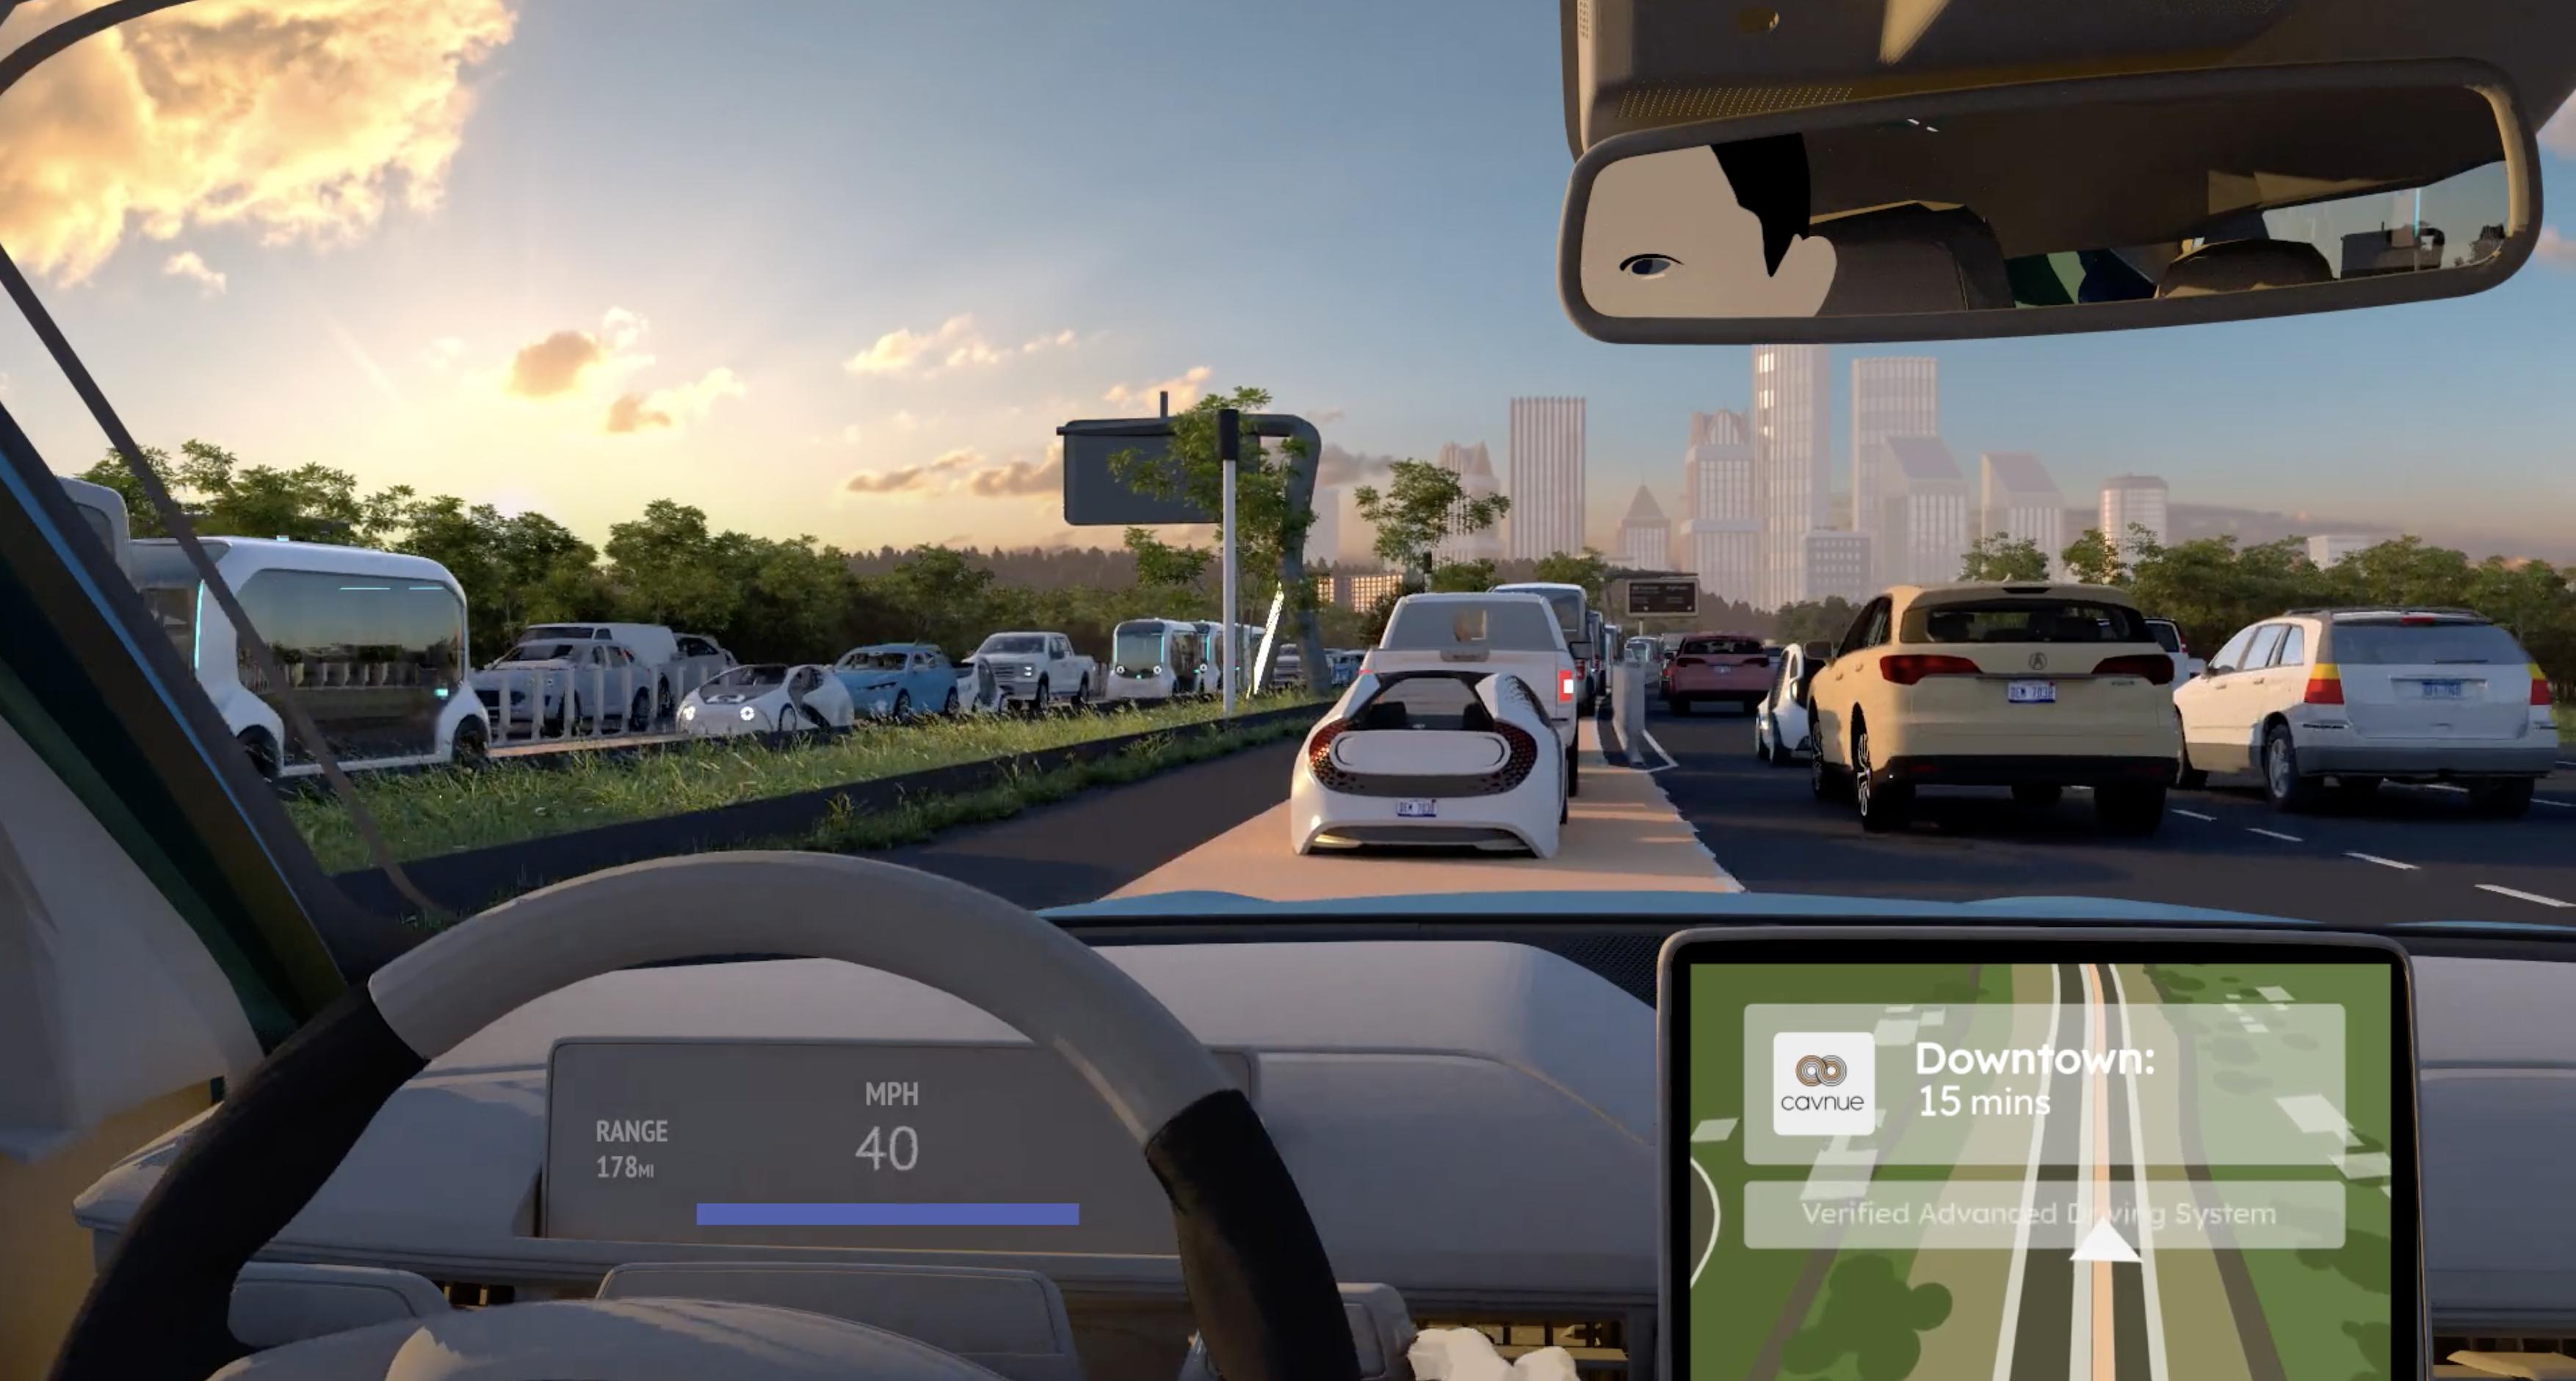 Advanced Driving System Cavnue